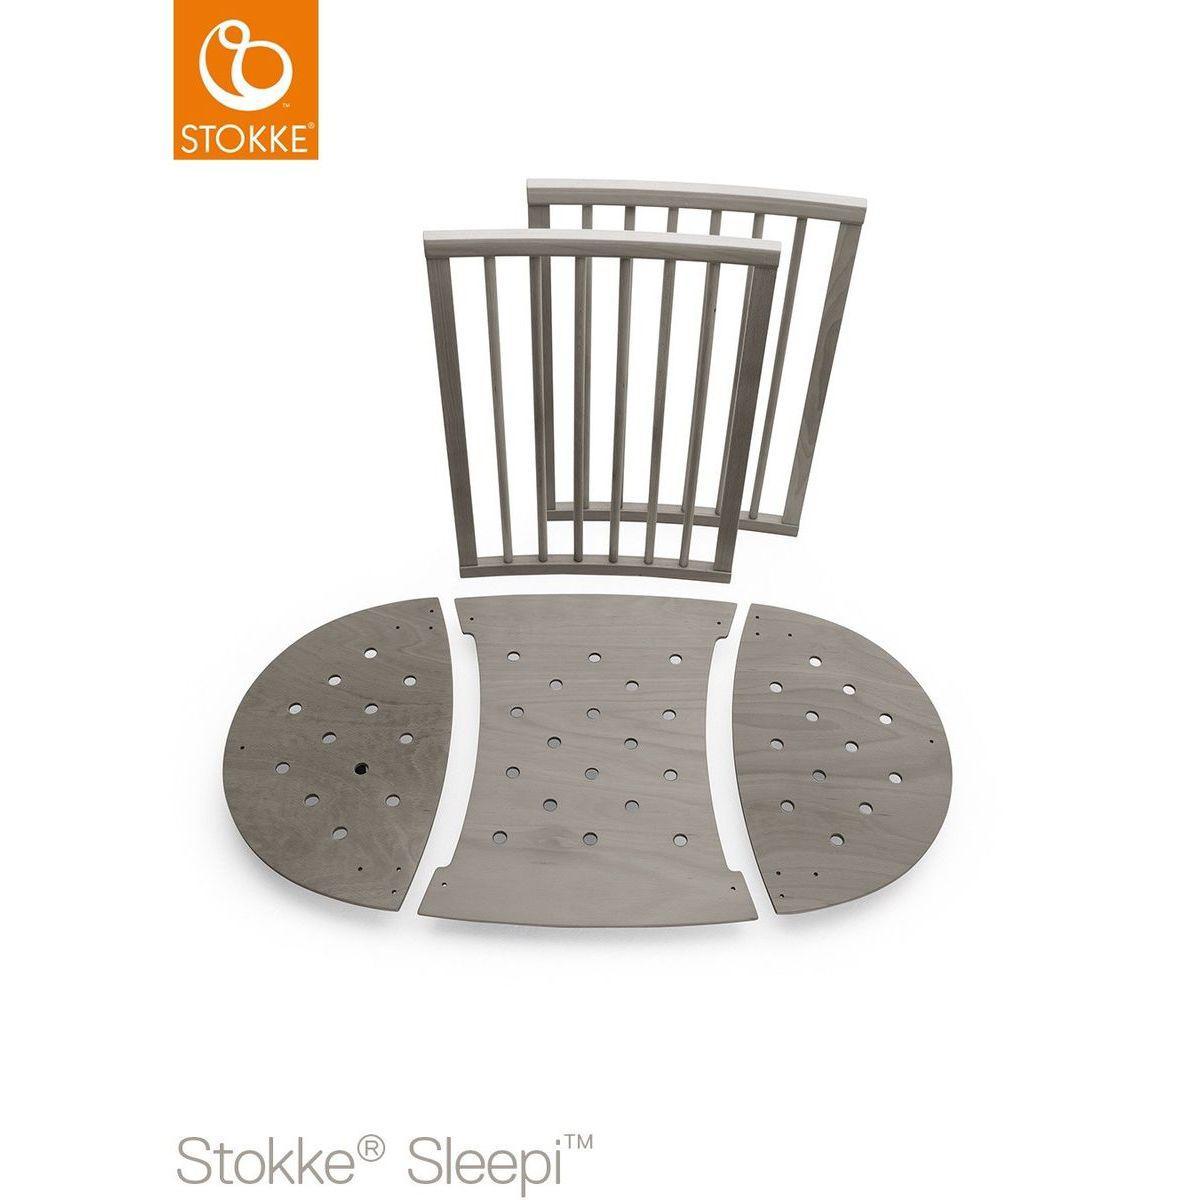 Kit extensión cuna SLEEPI Stokke gris bruma